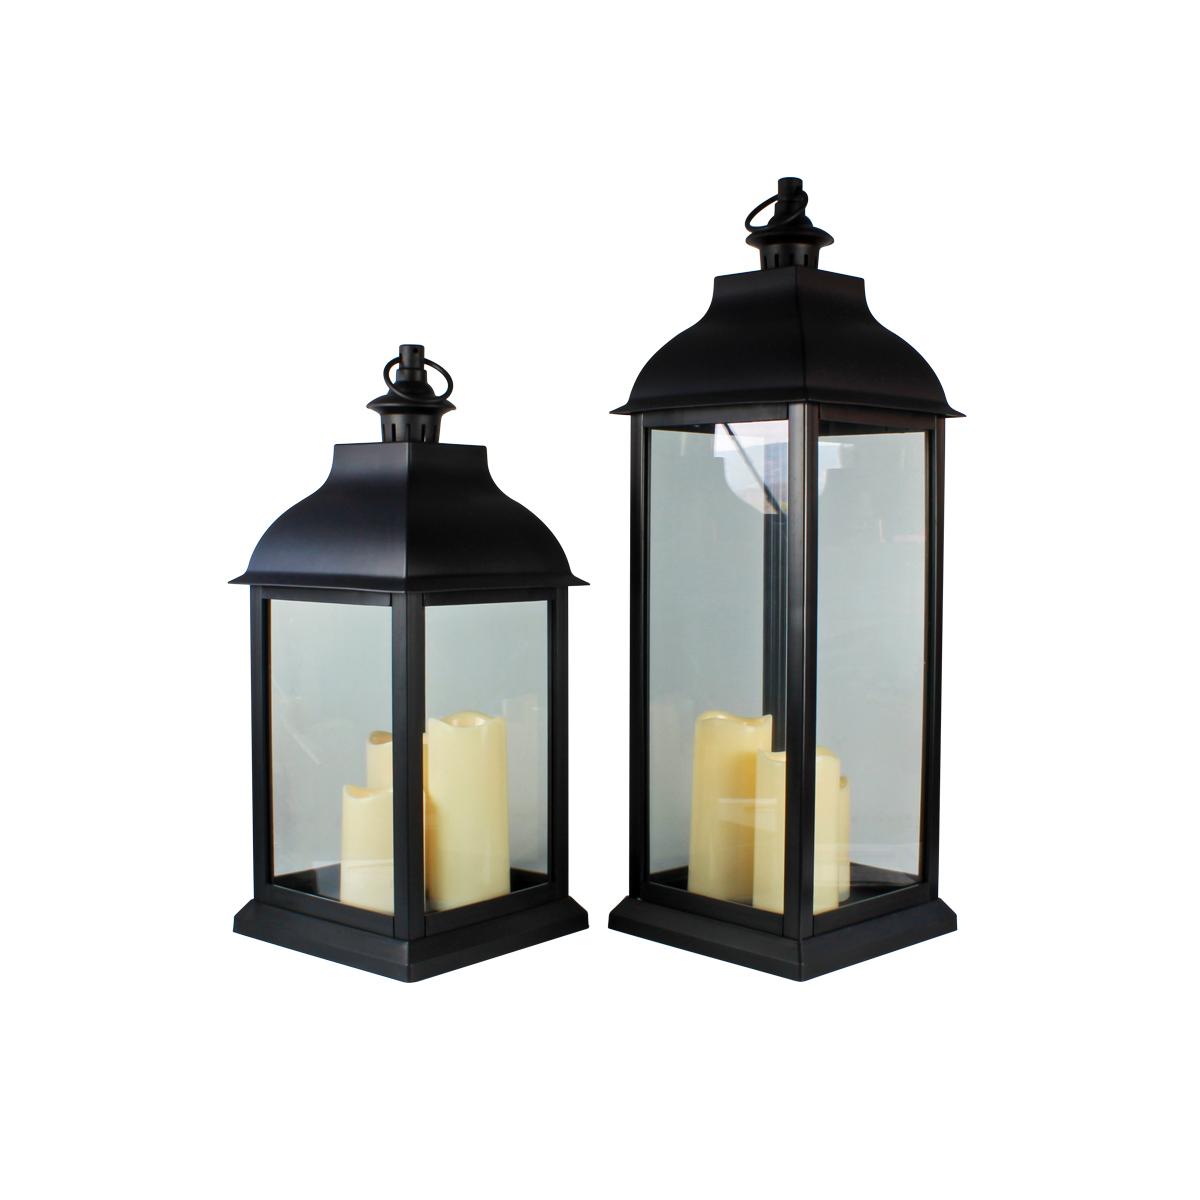 Conj. C/ 2 Lanternas Marroquinas Decorativas C/ Velas LED Pretas